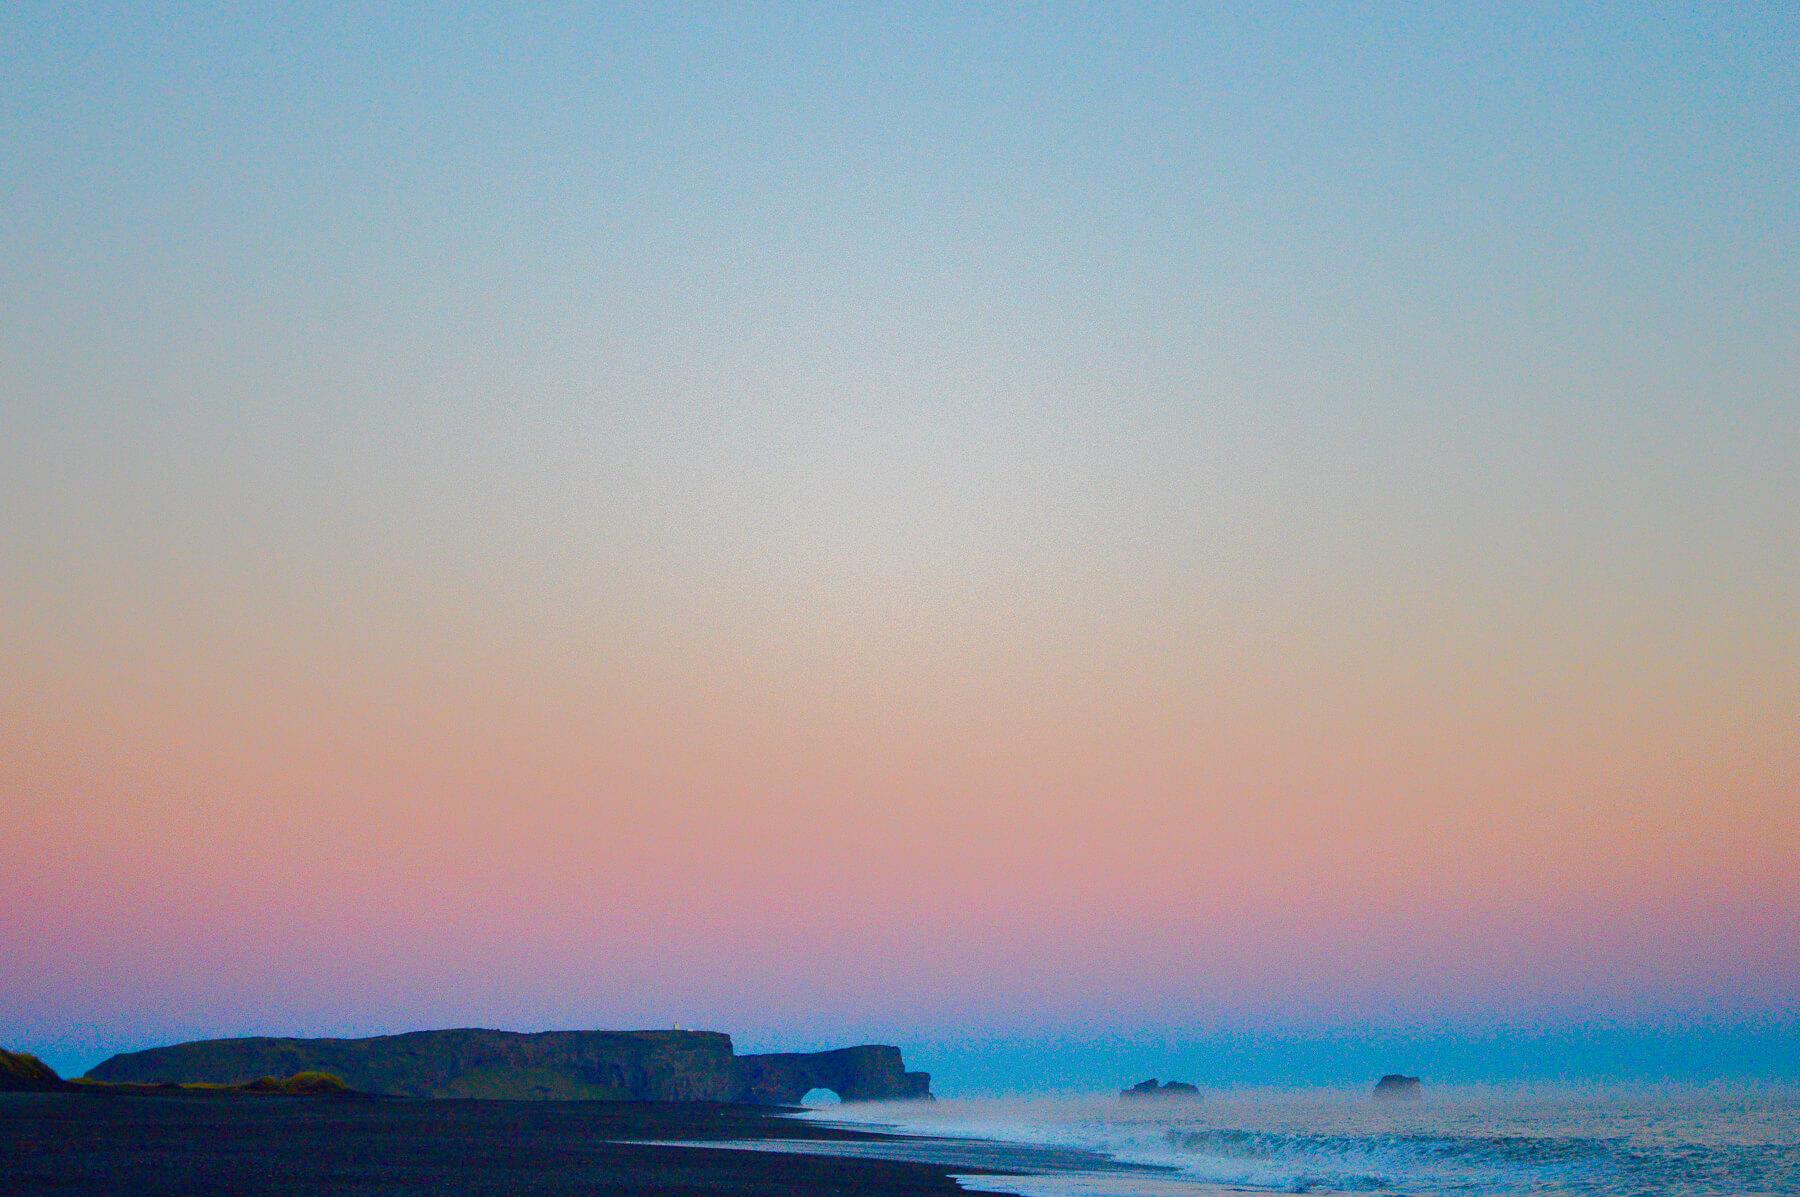 Sunset over Iceland's black beach and Dyrholaey